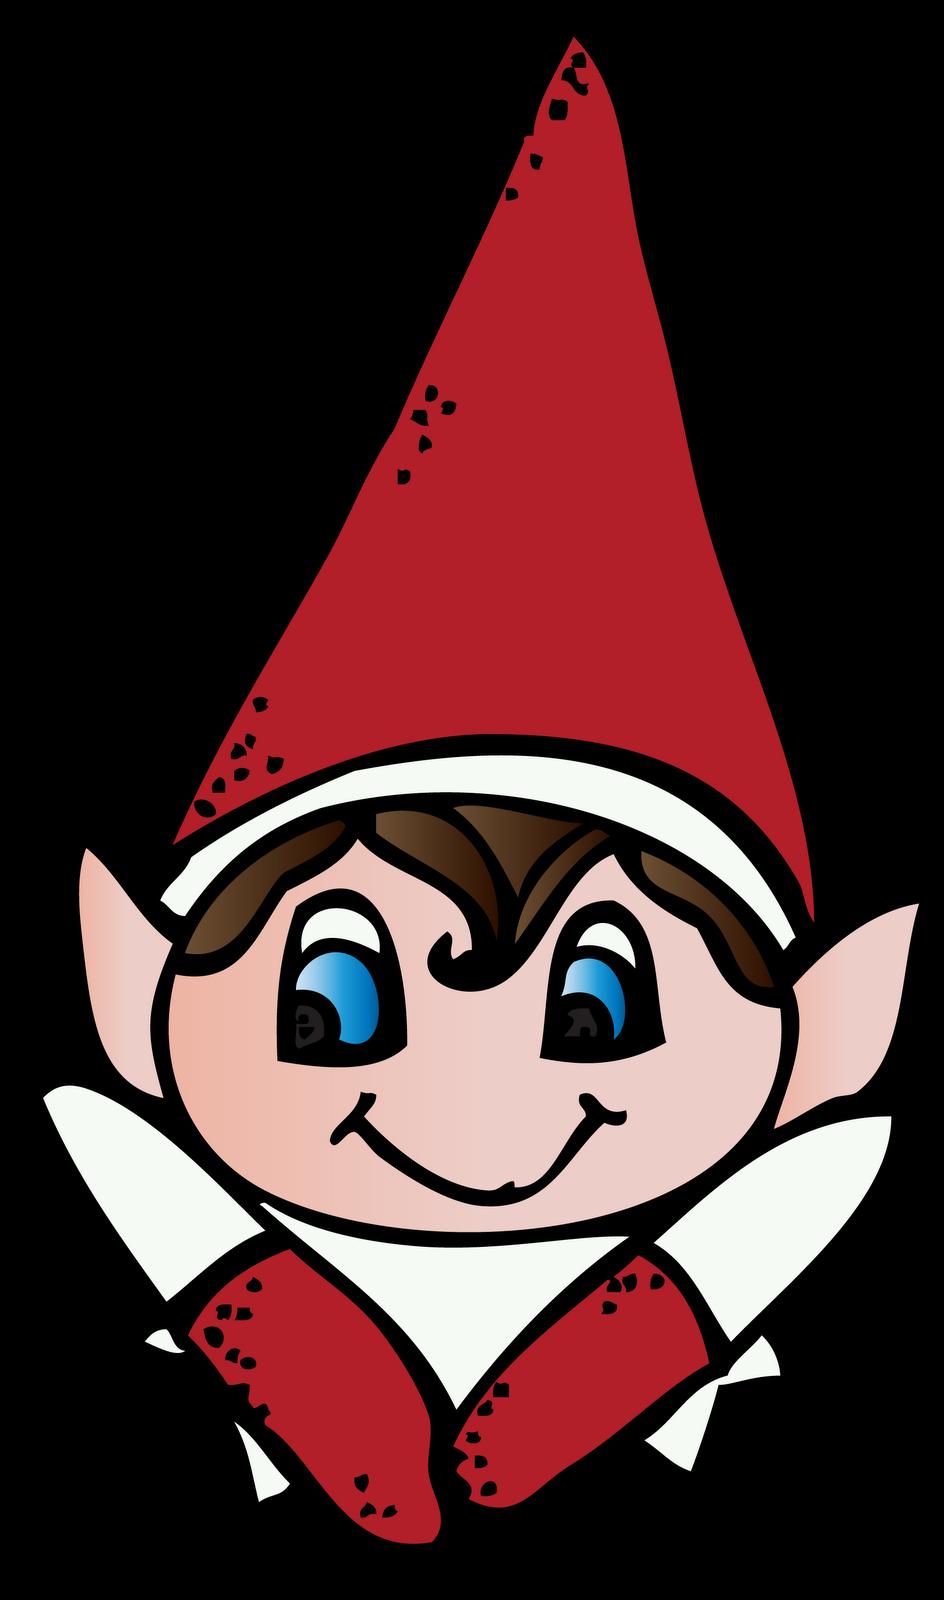 944x1600 Girl Elf On The Shelf Clipart